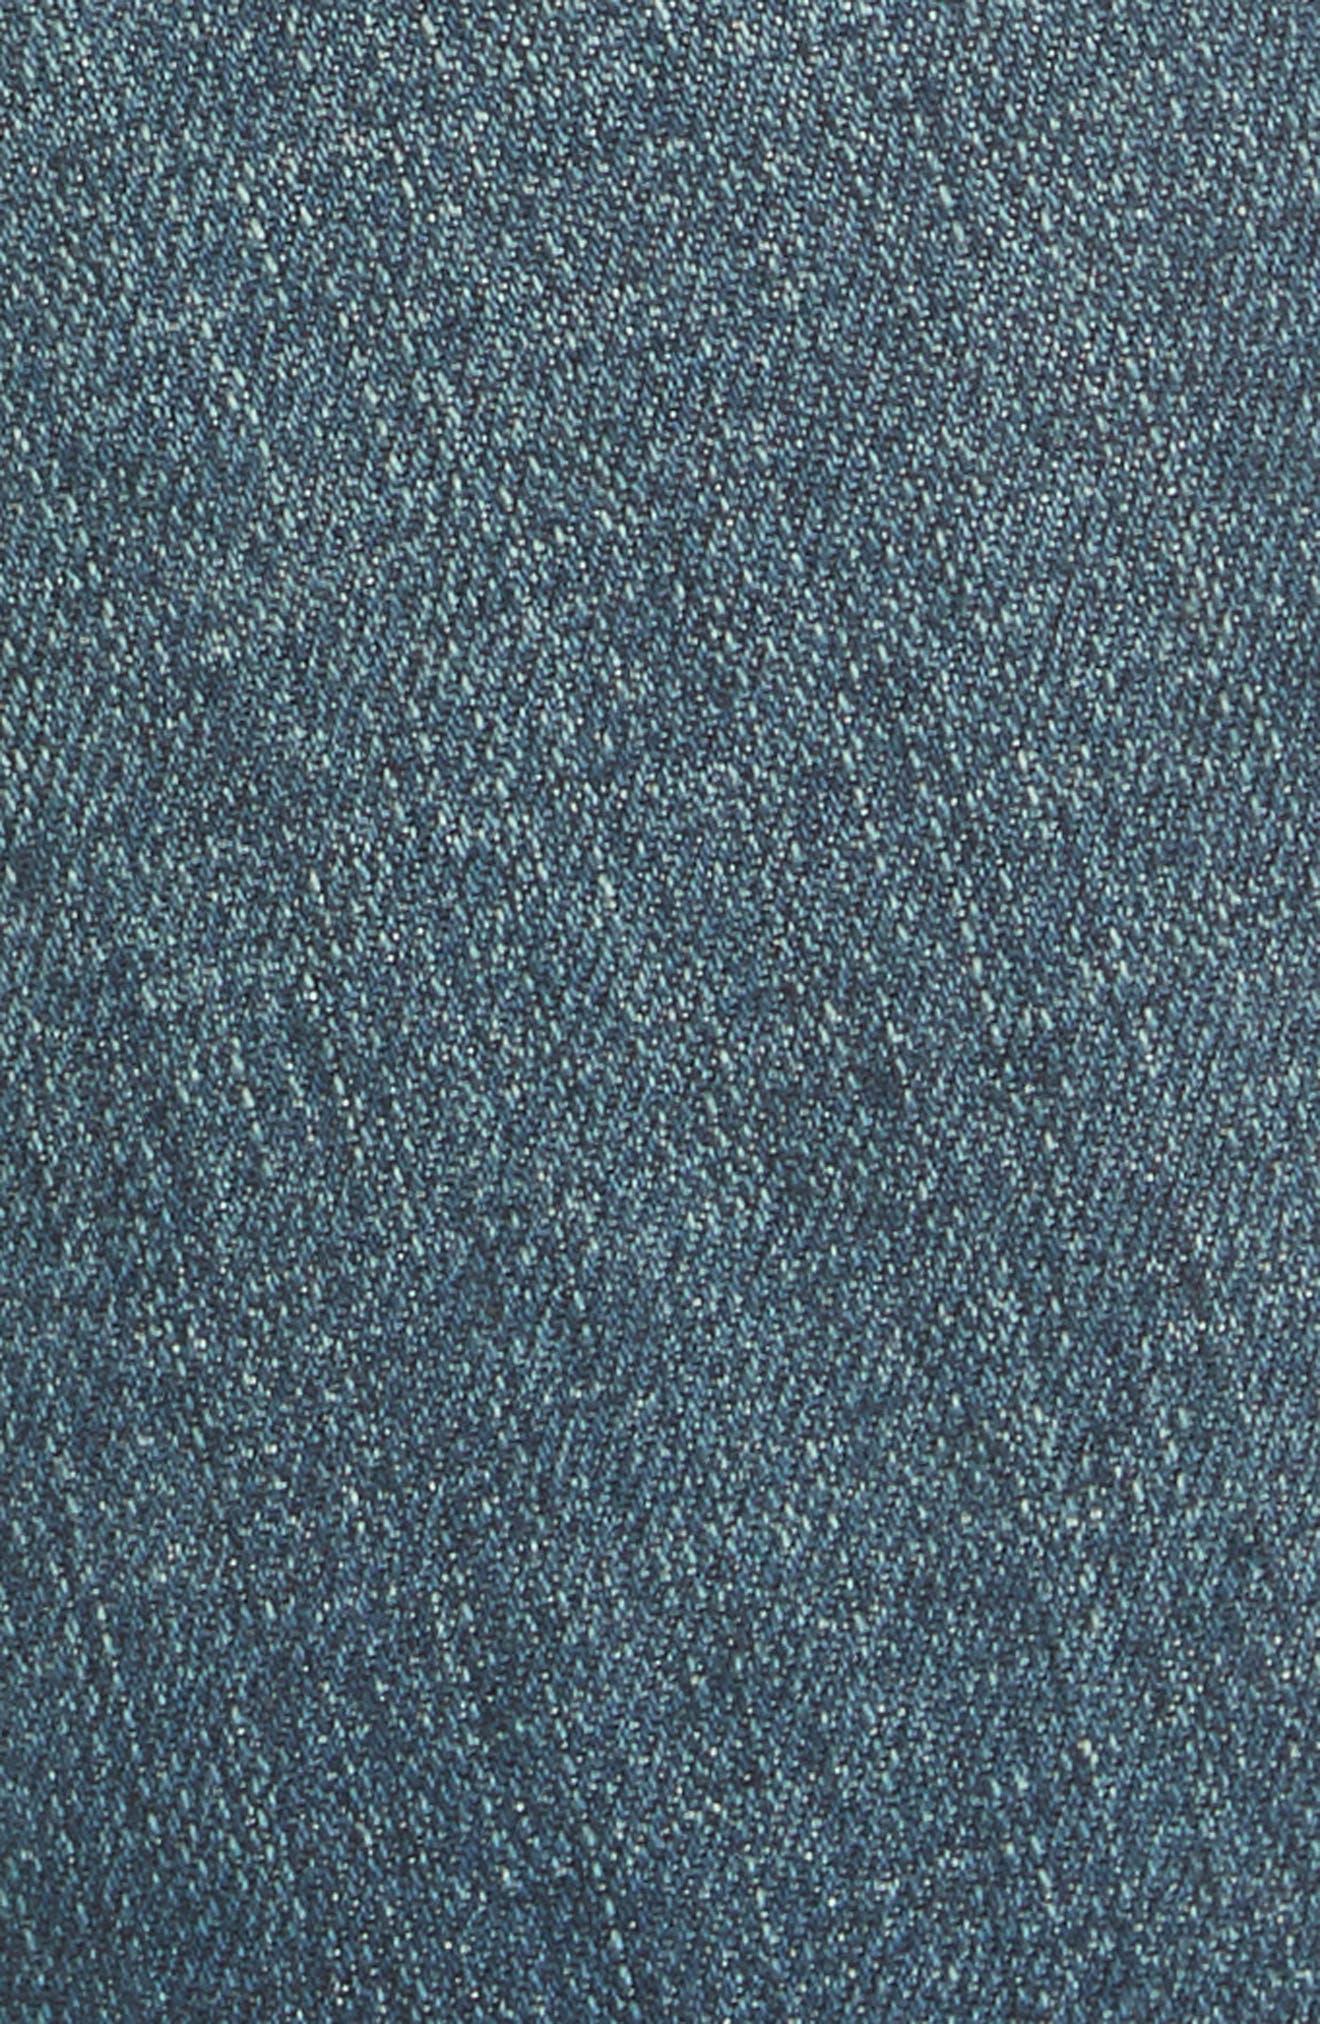 Studded Crop Flare Jeans,                             Alternate thumbnail 3, color,                             Dark Denim